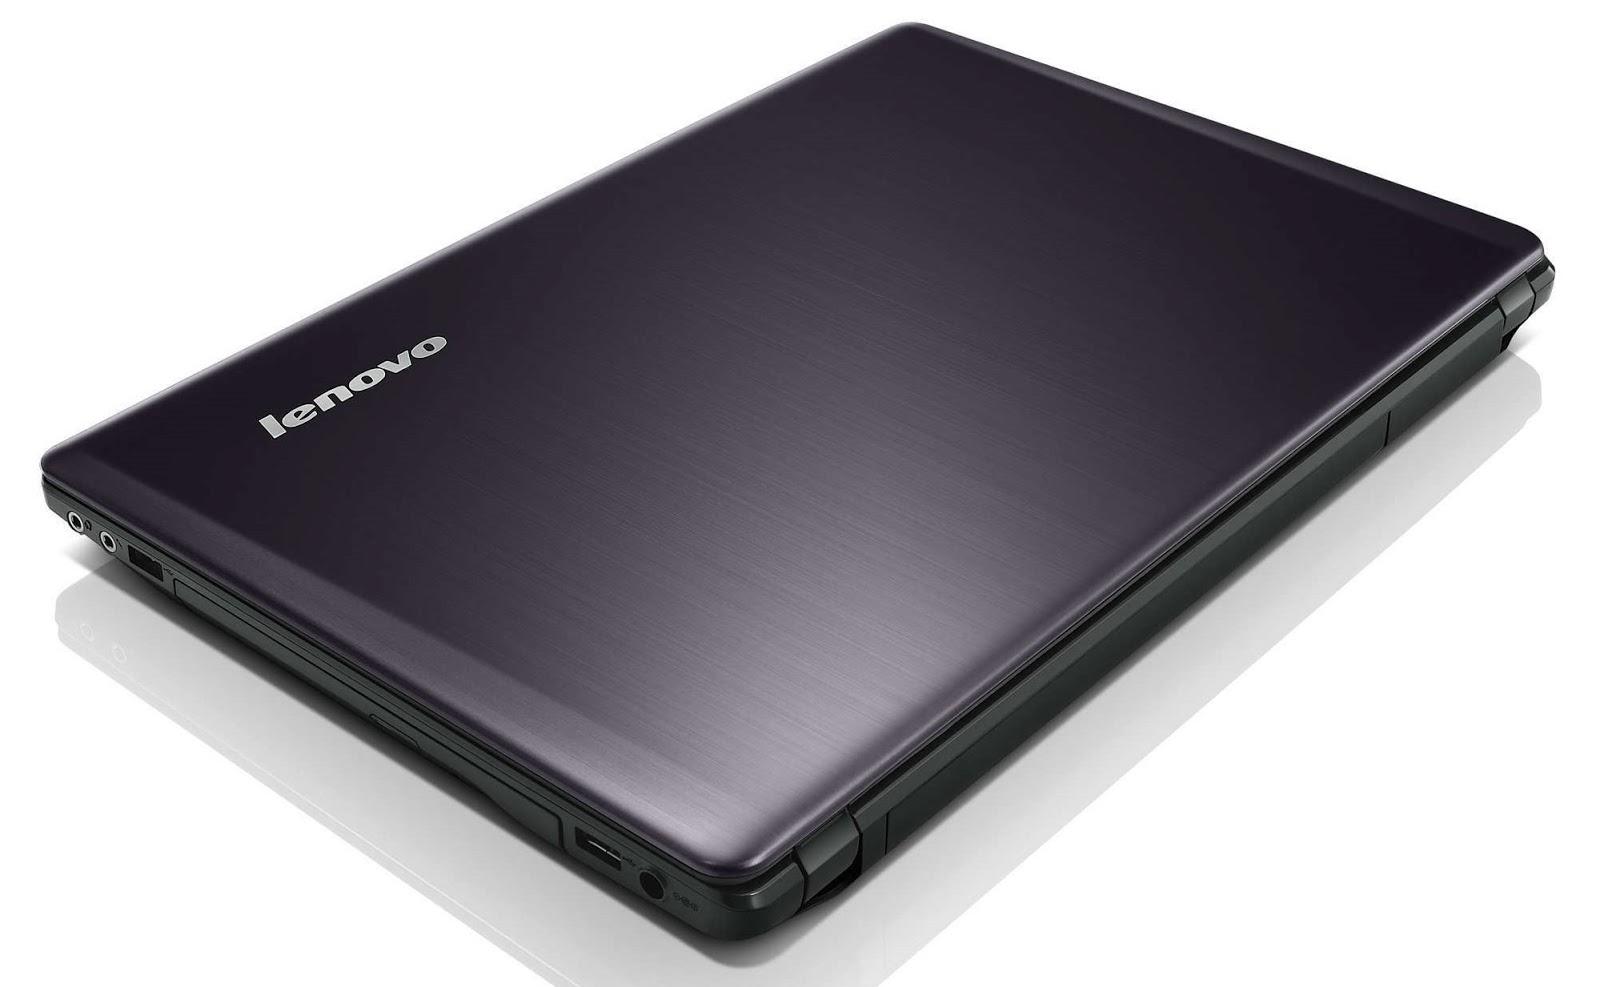 Lenovo y480 coupons